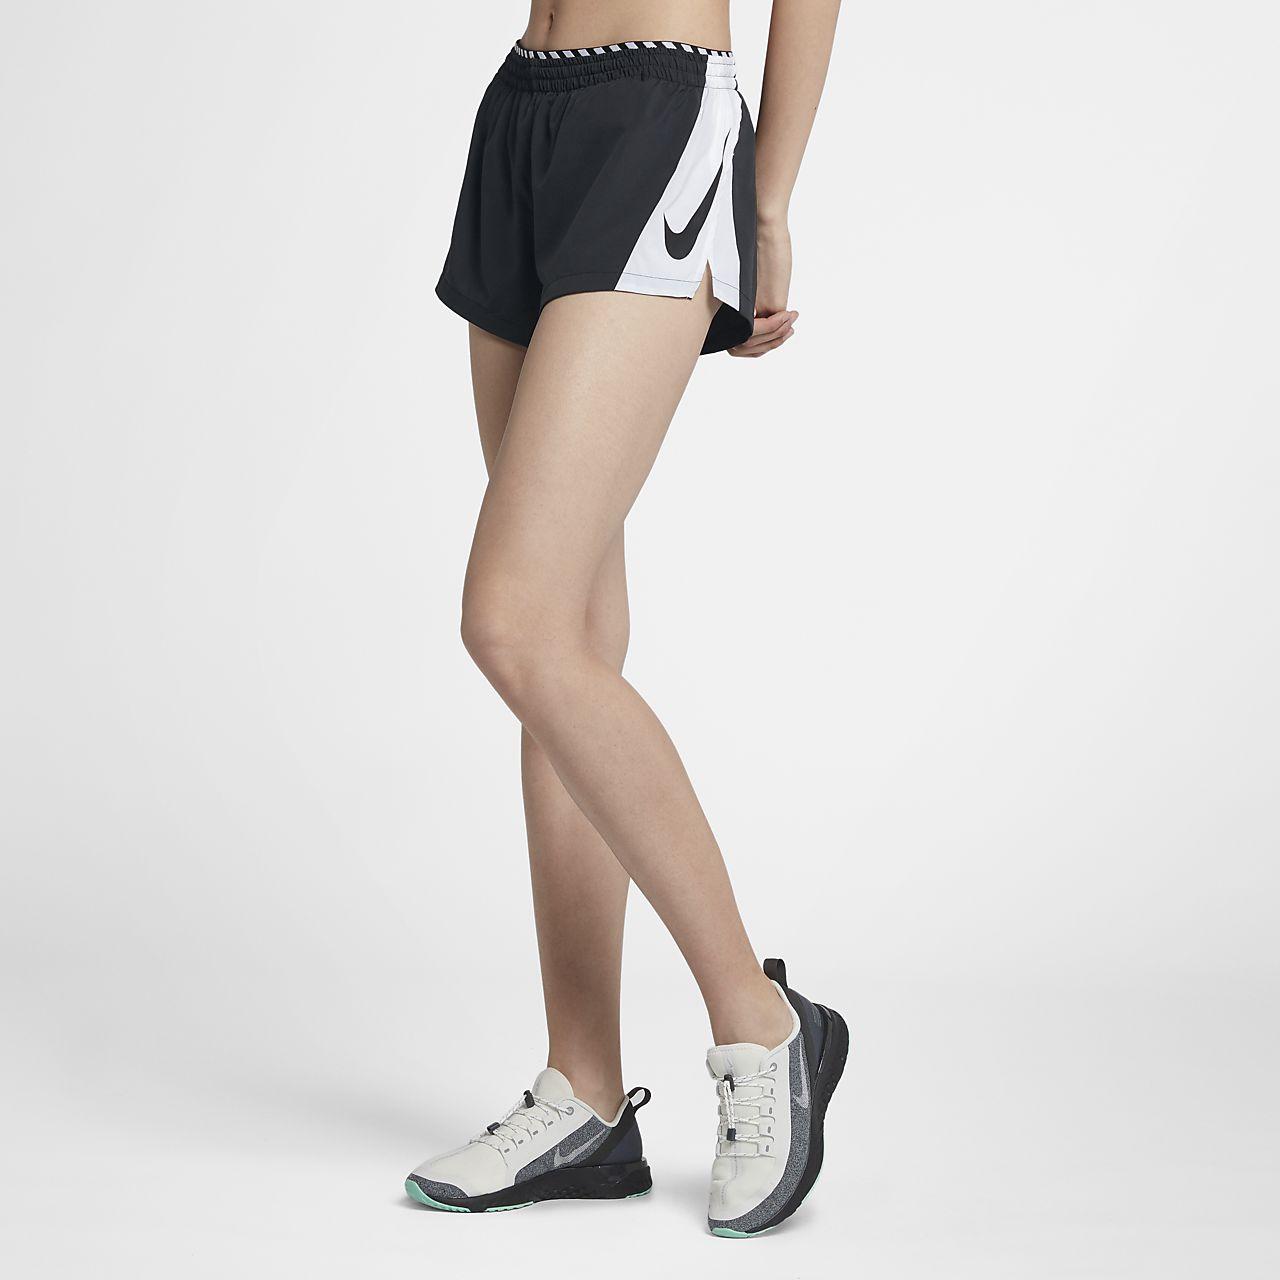 Nike Elevate 女子跑步短裤